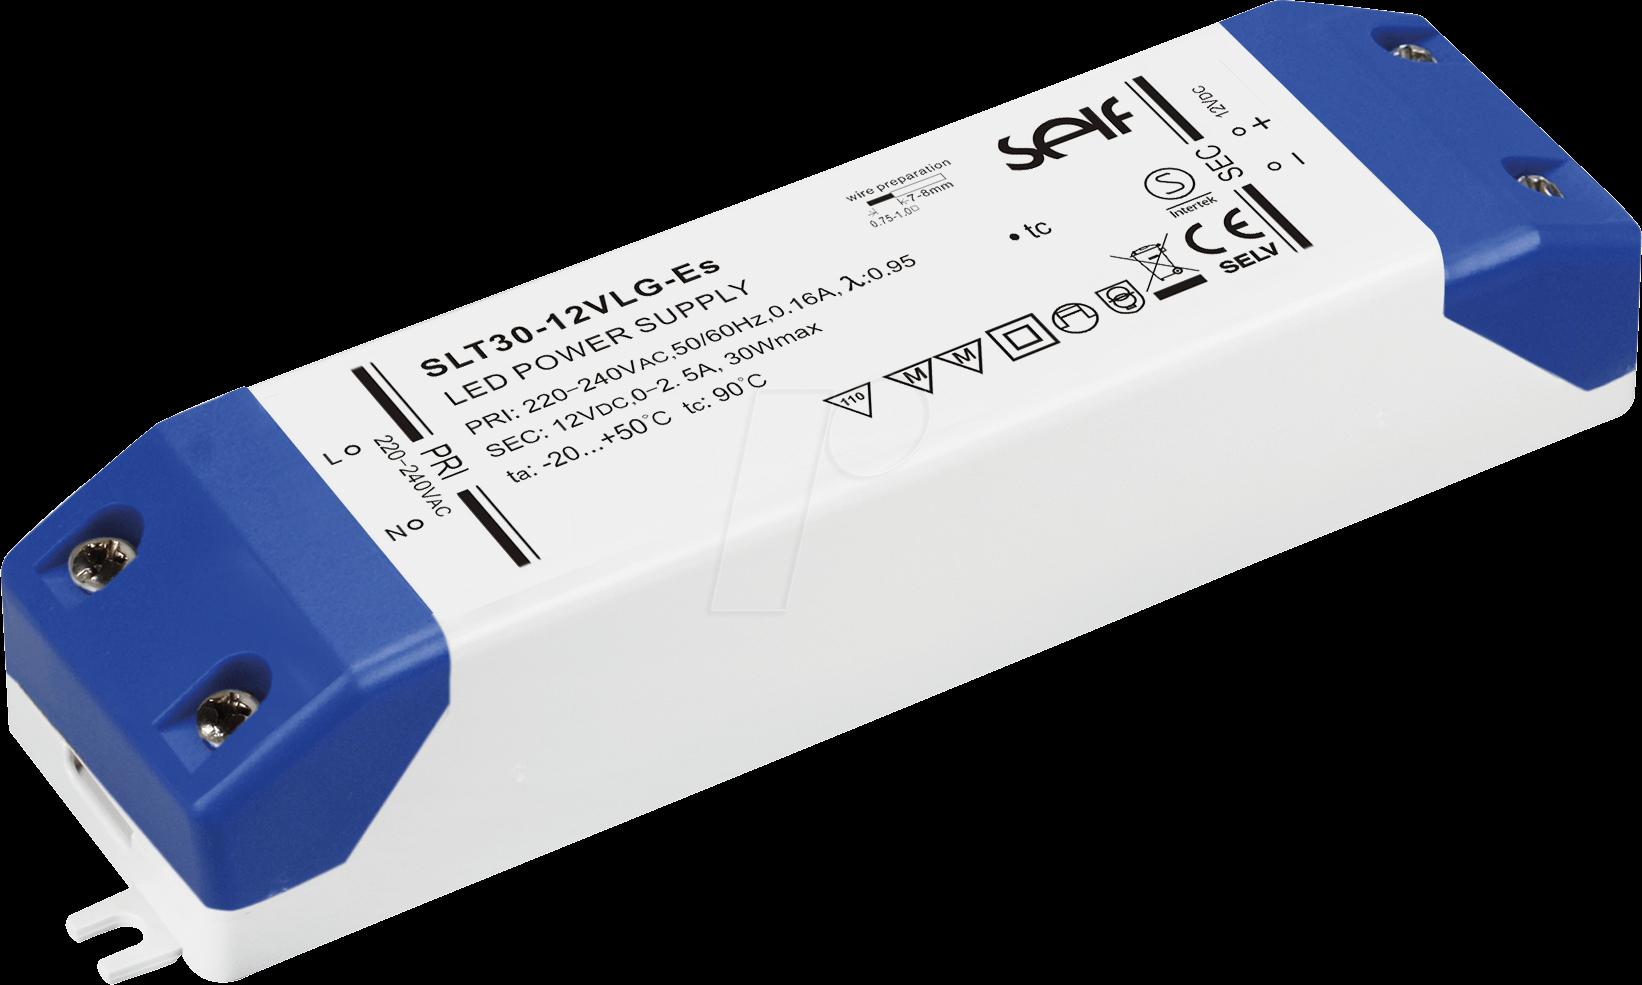 Slf Slt30 24vlg Led Trafo 30 W 24 V Dc 1250 Ma Bei Reichelt Volt Battery Circuit Wiring Self